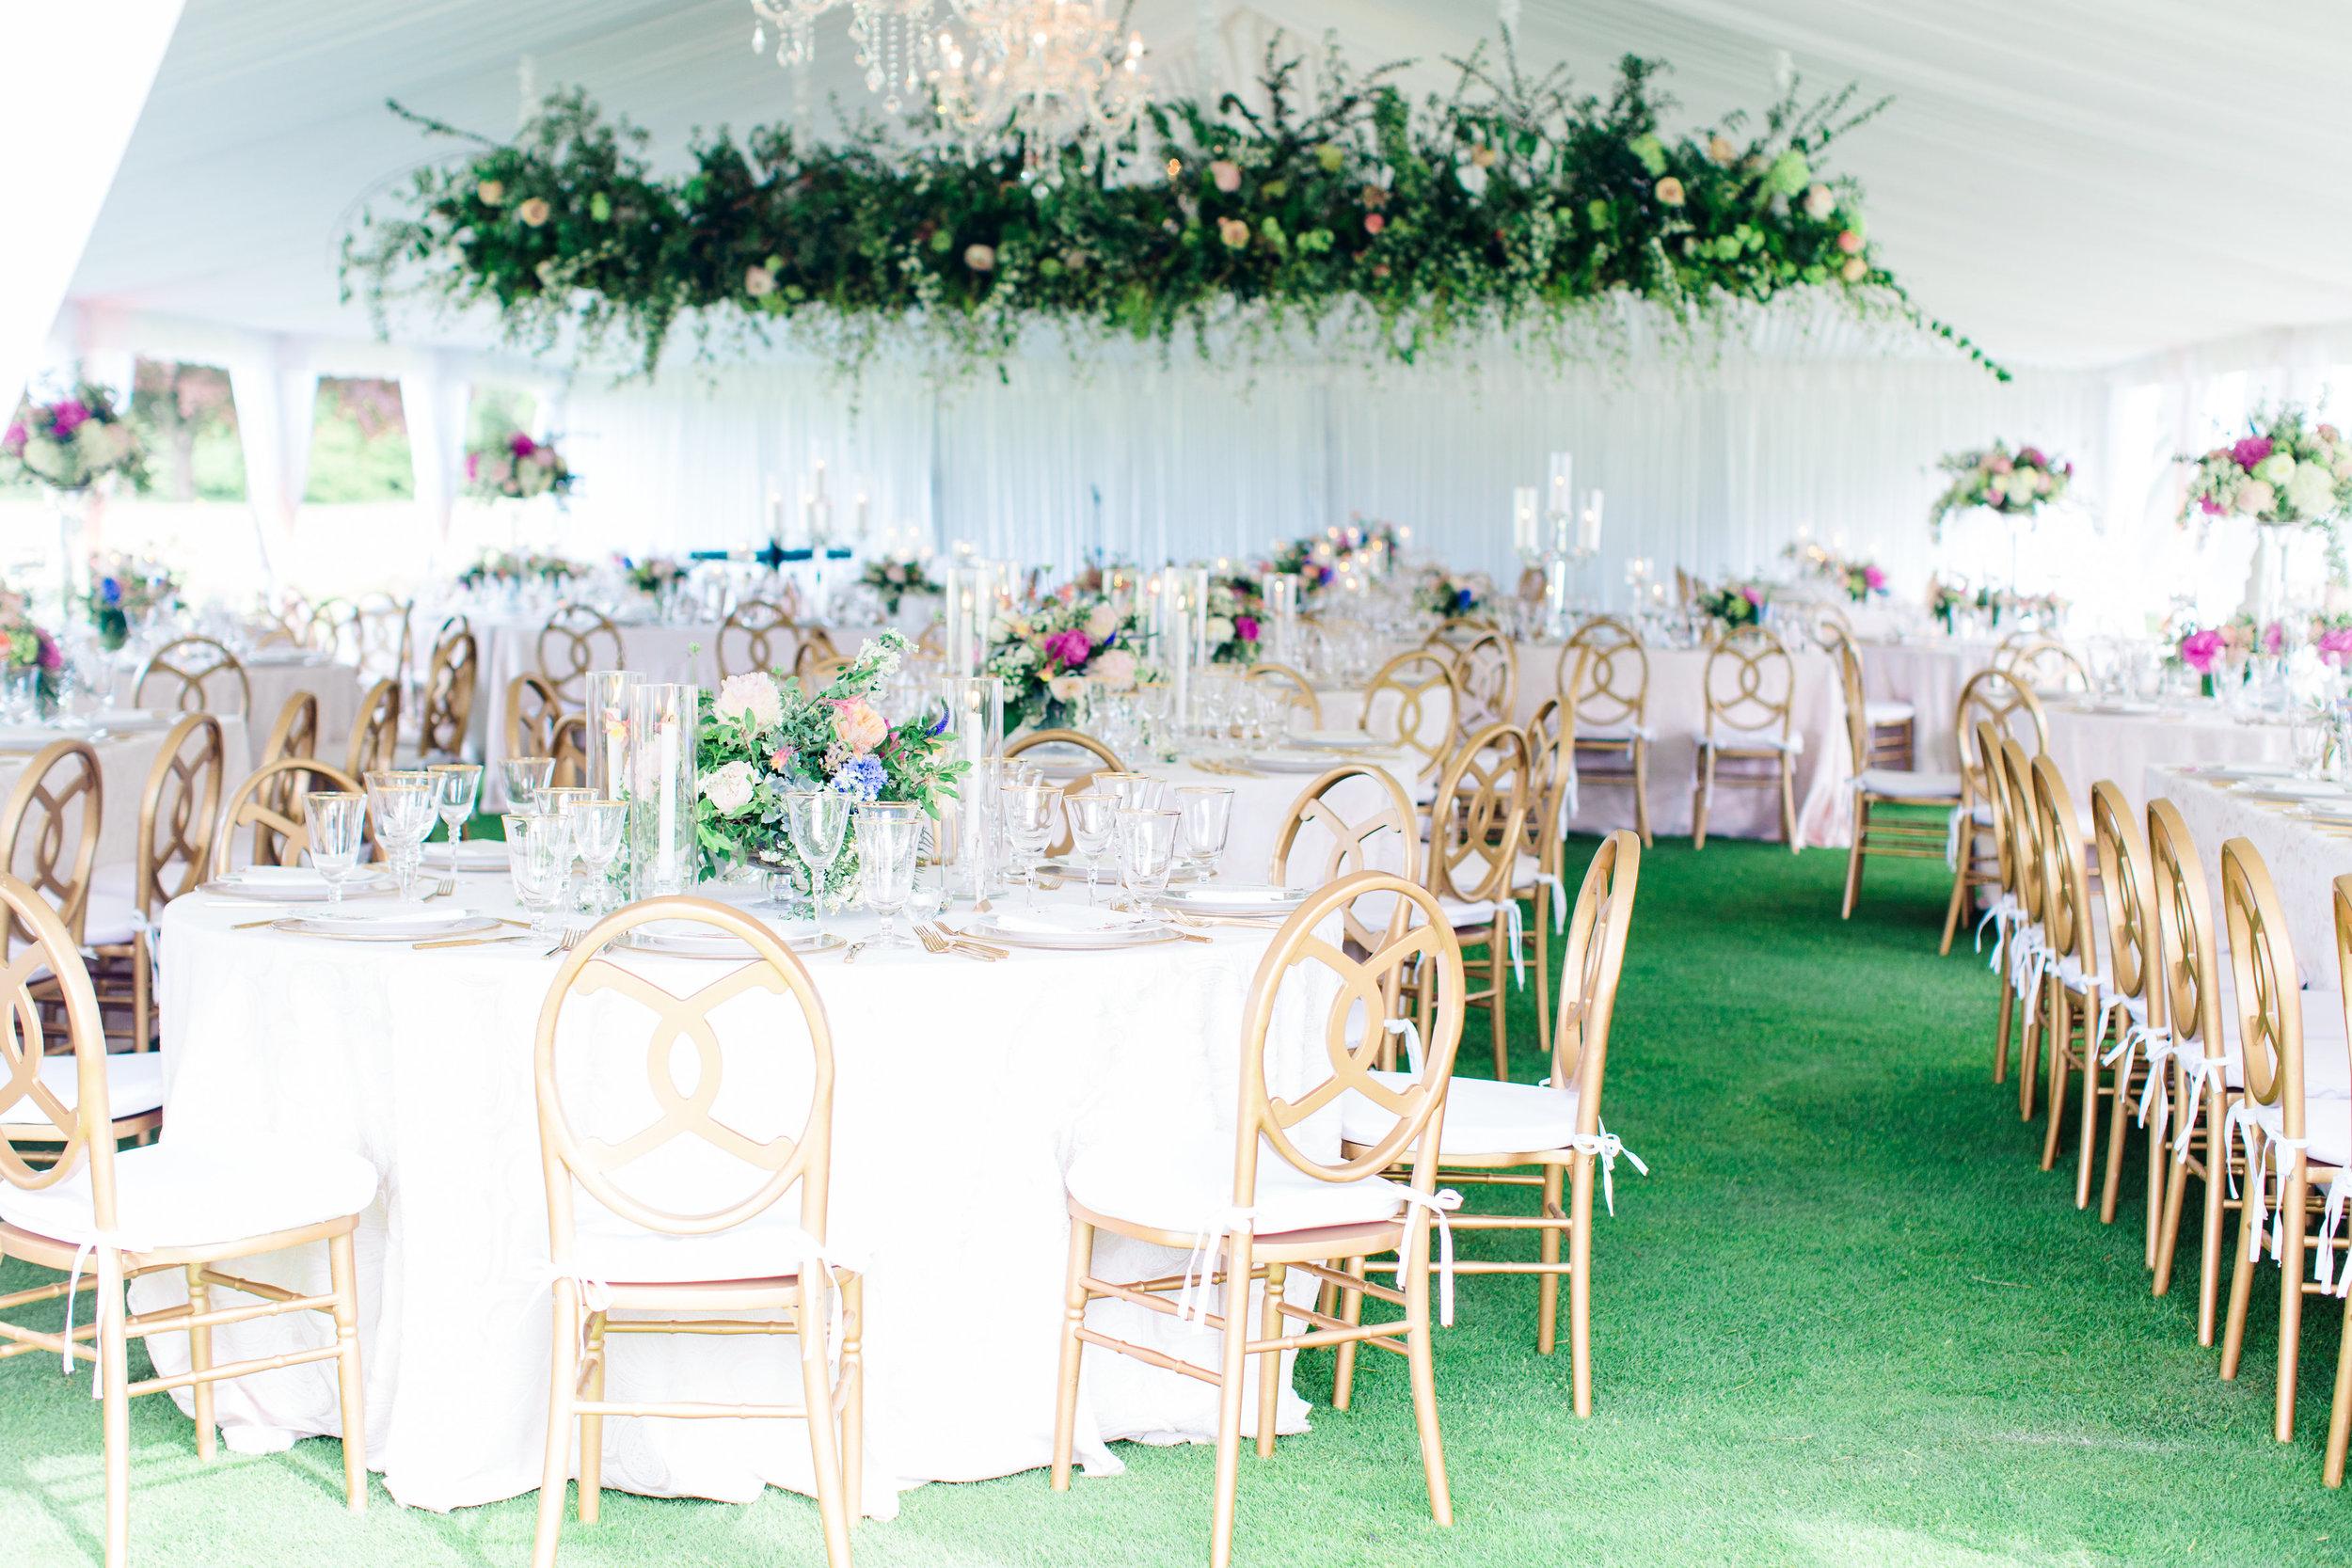 Coffman+Wedding+Reception+Details-2.jpg